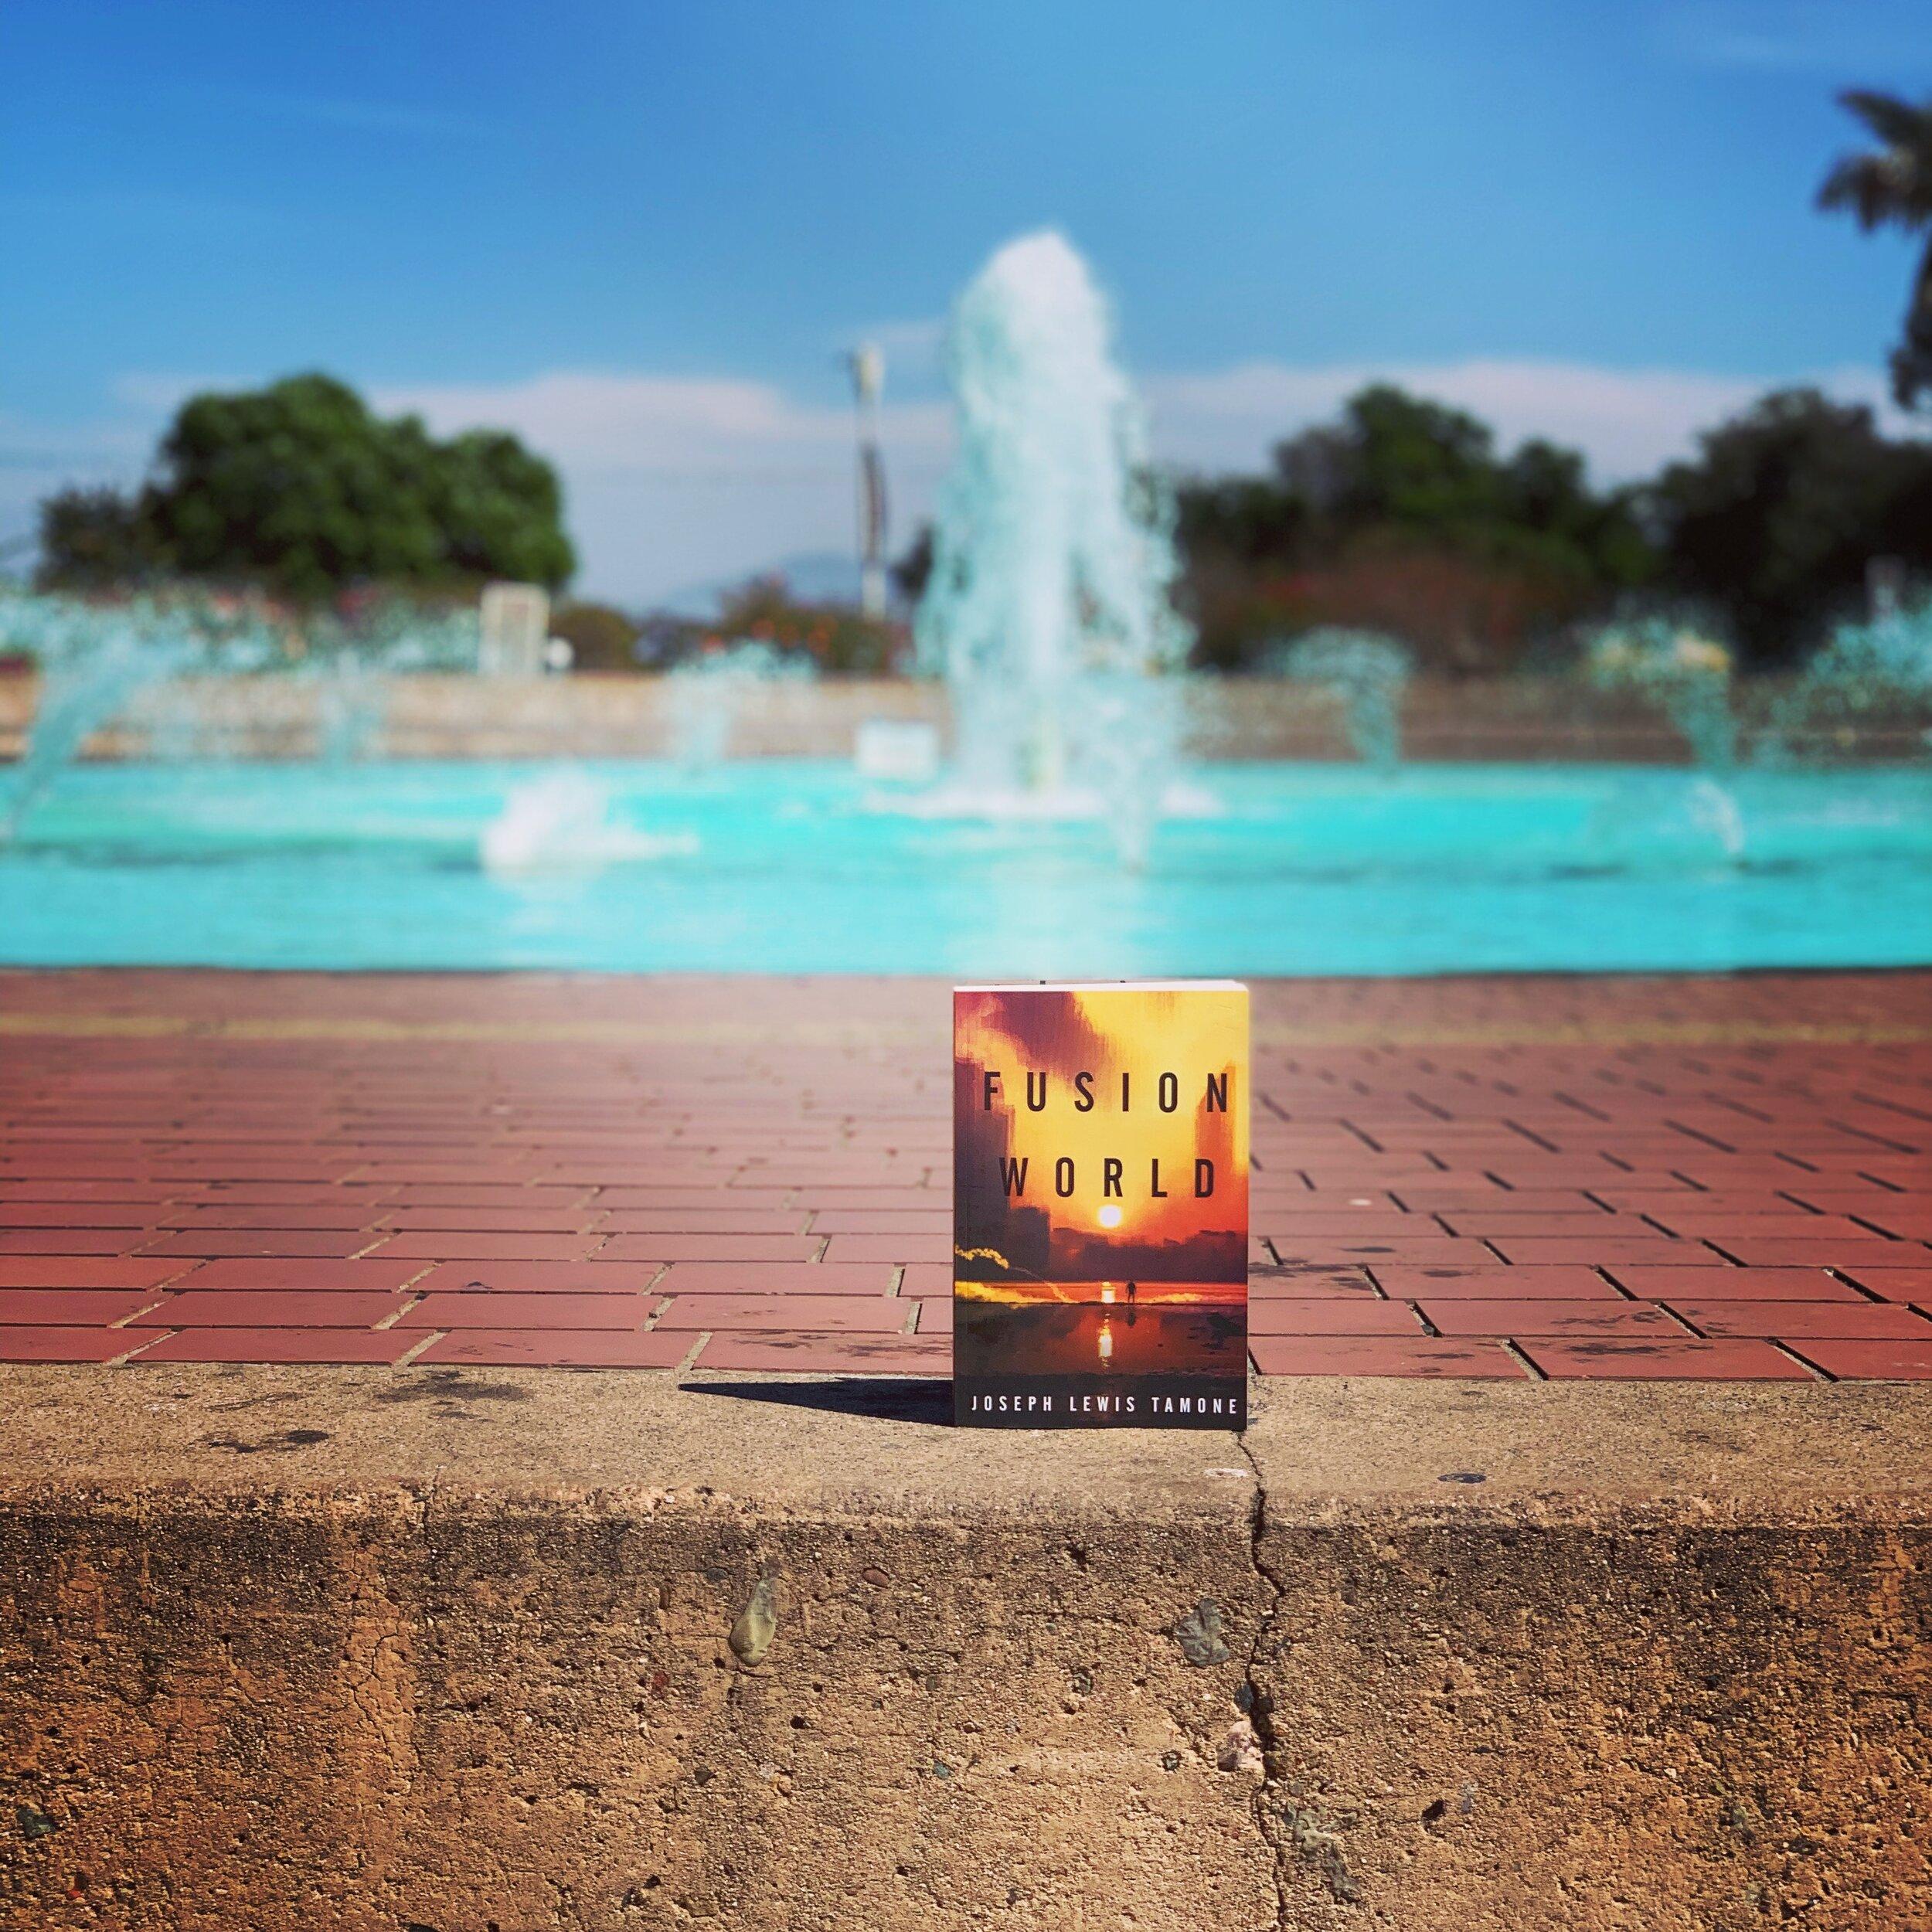 Fusion World at Bea Evanson Fountain.